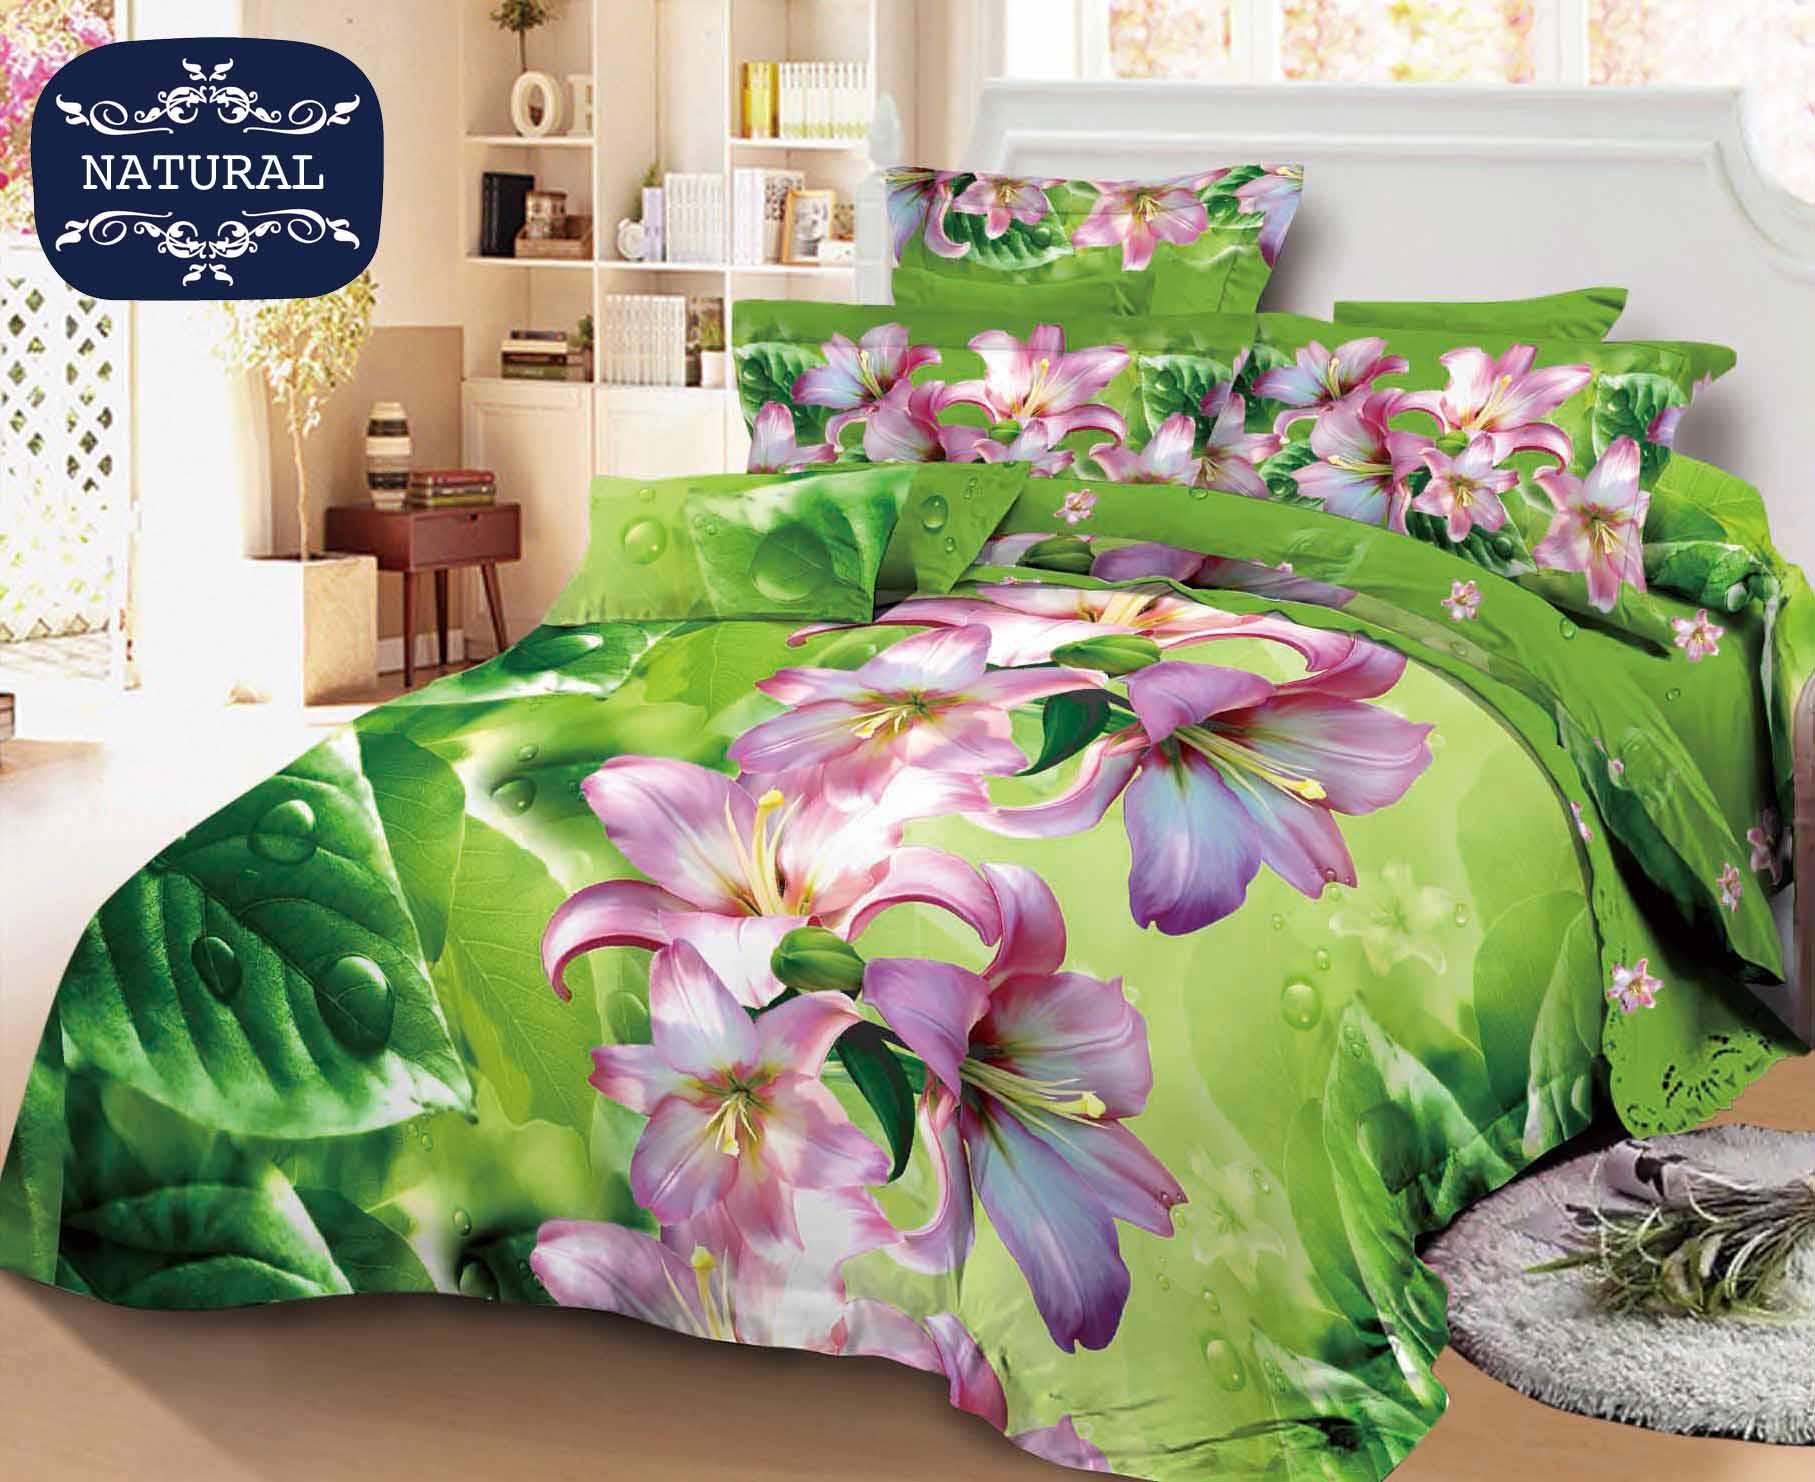 harga Sprei Karet Kintakun Luxury 160x200 B2 Motif Natural Tokopedia.com